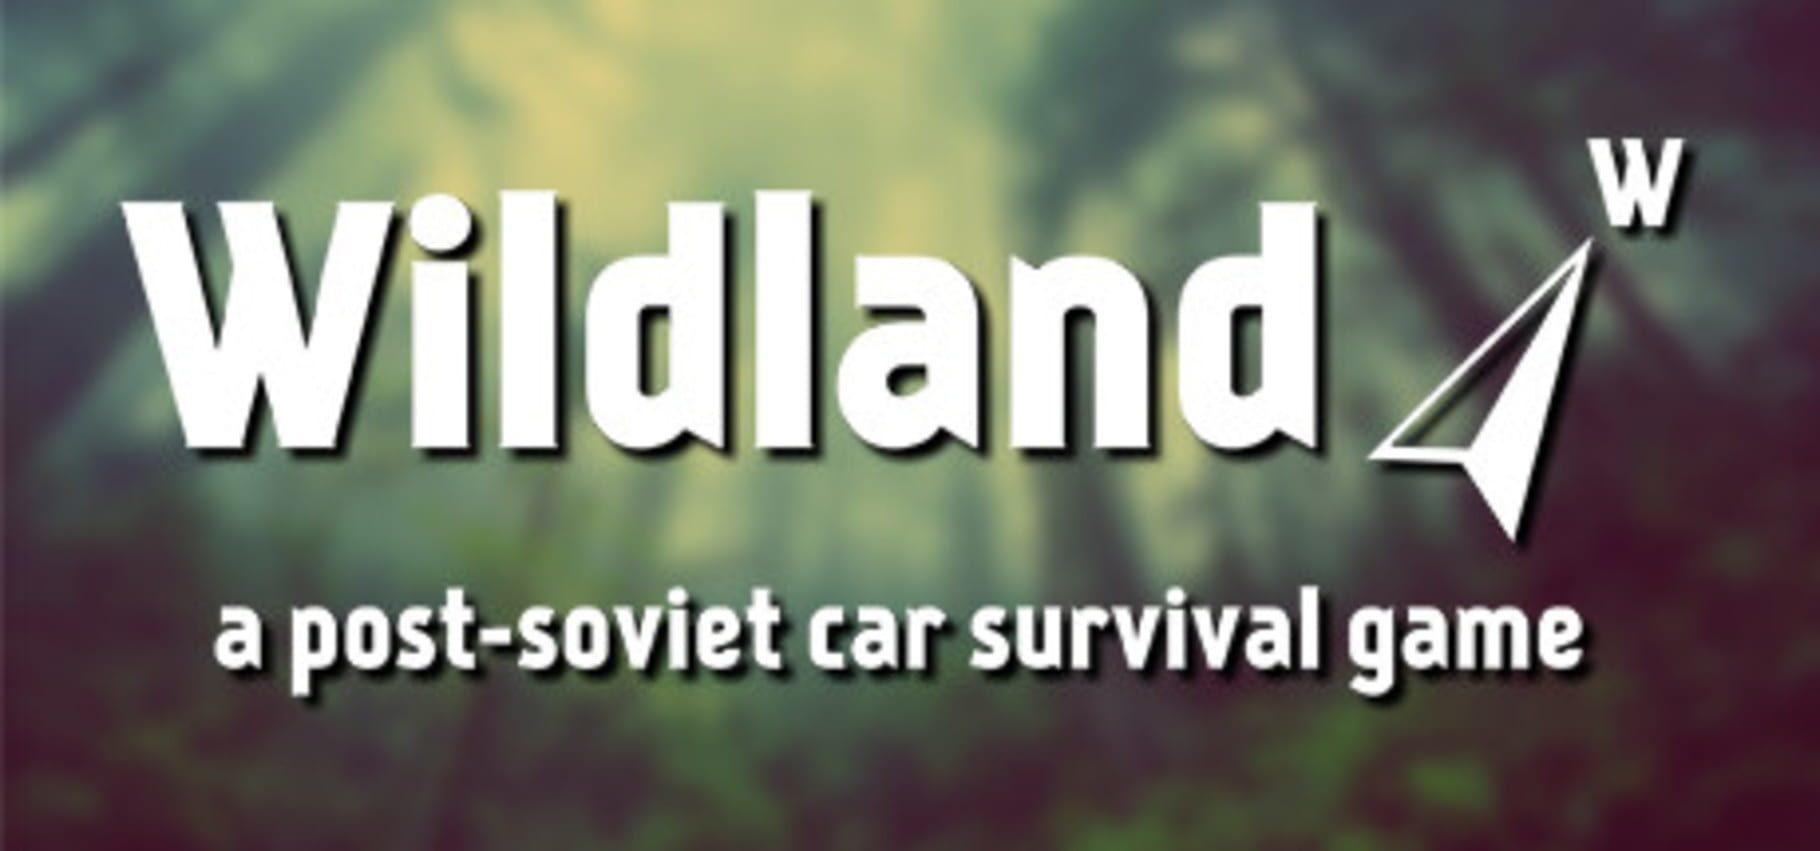 buy Wildland cd key for xbox platform